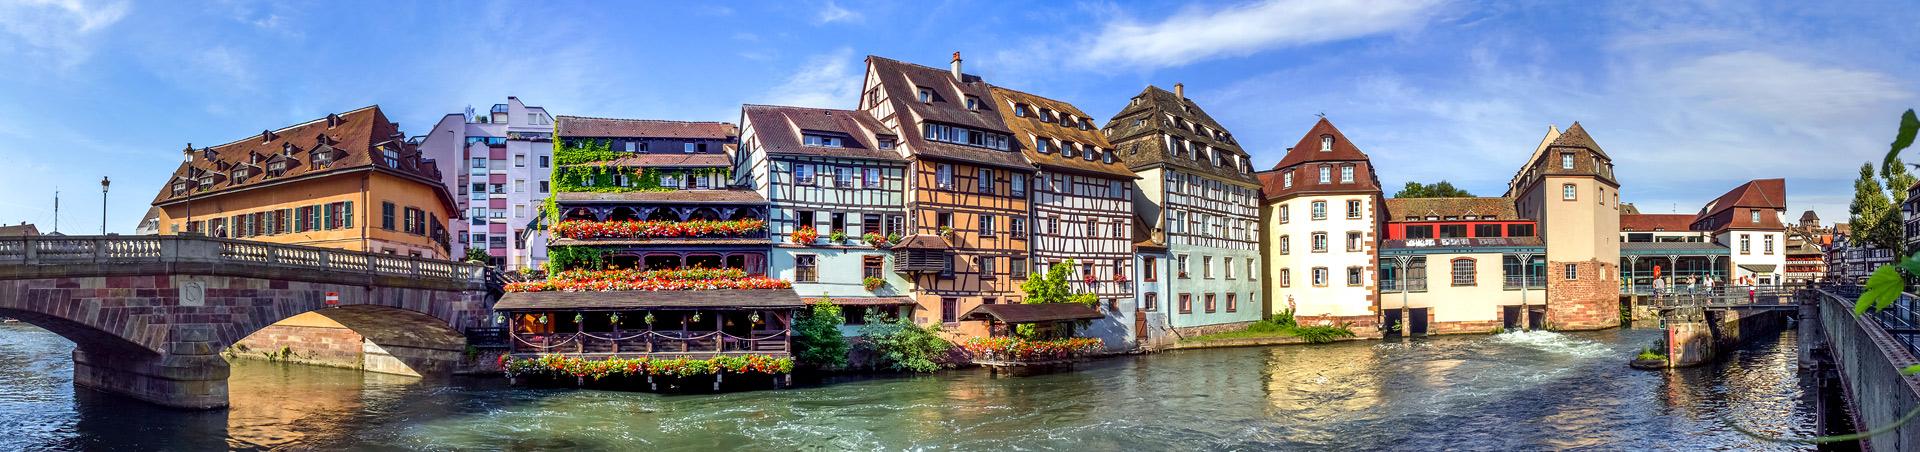 River Queen Exterior Rhine